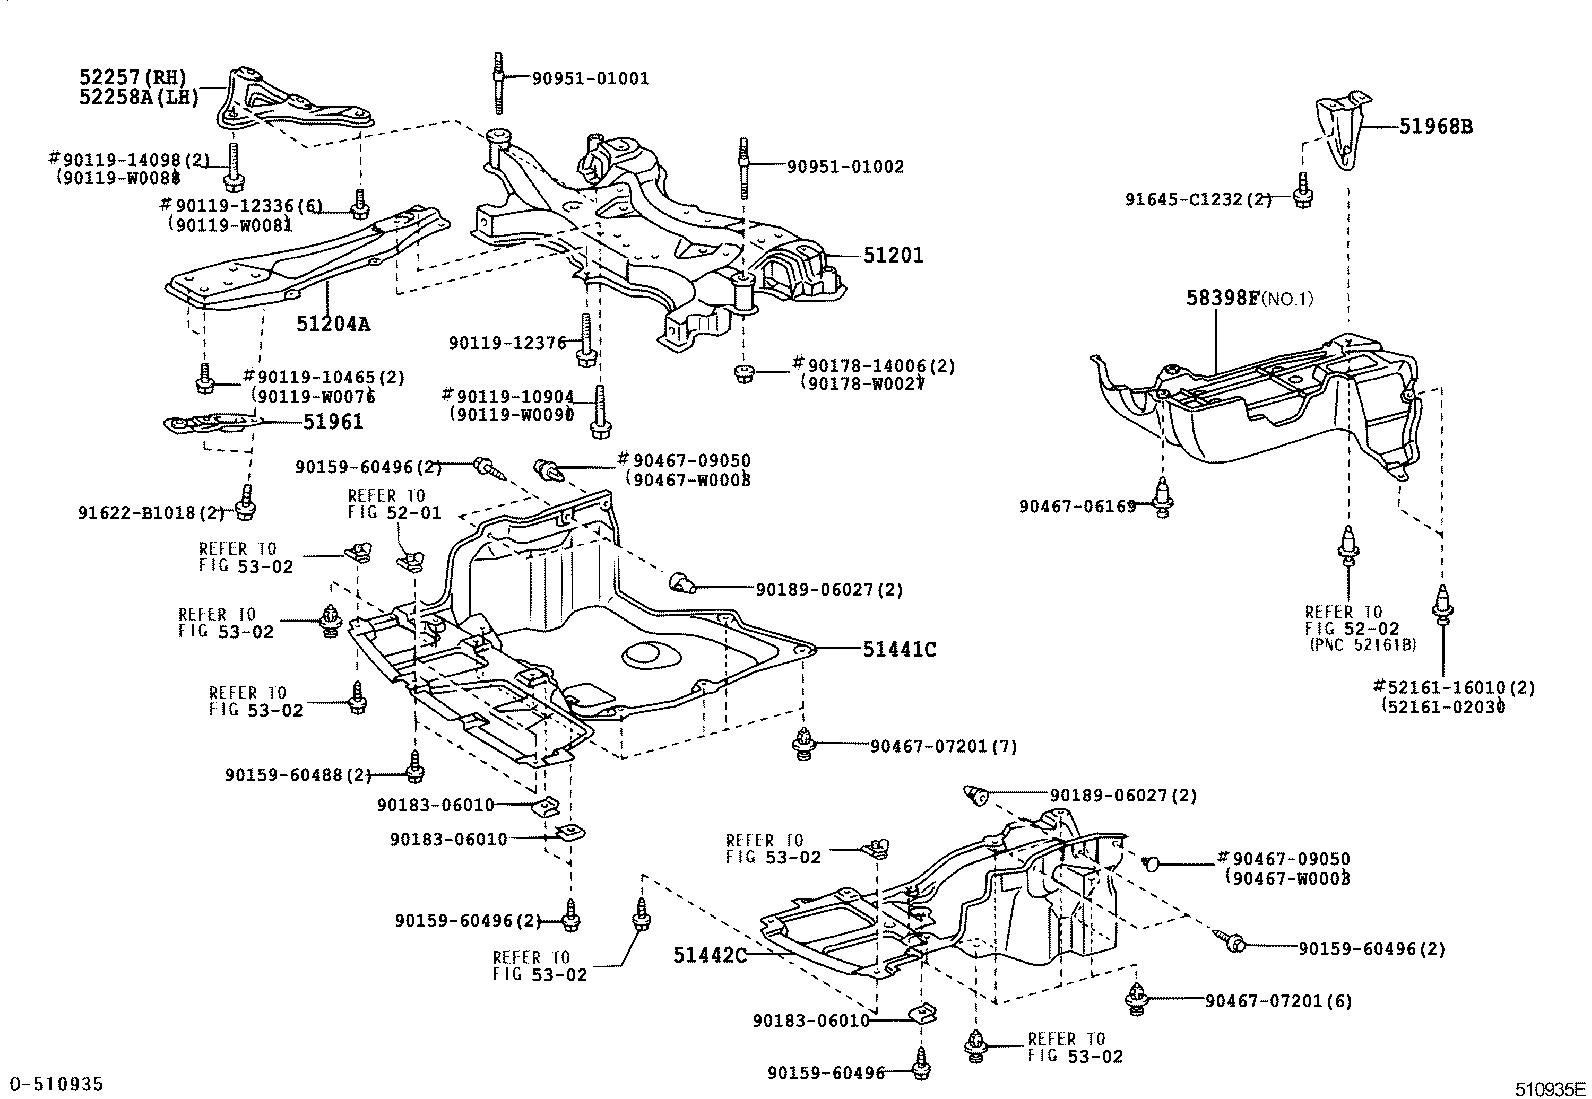 1986 toyota mr2 wiring diagram vw golf gti mk1 parts auto